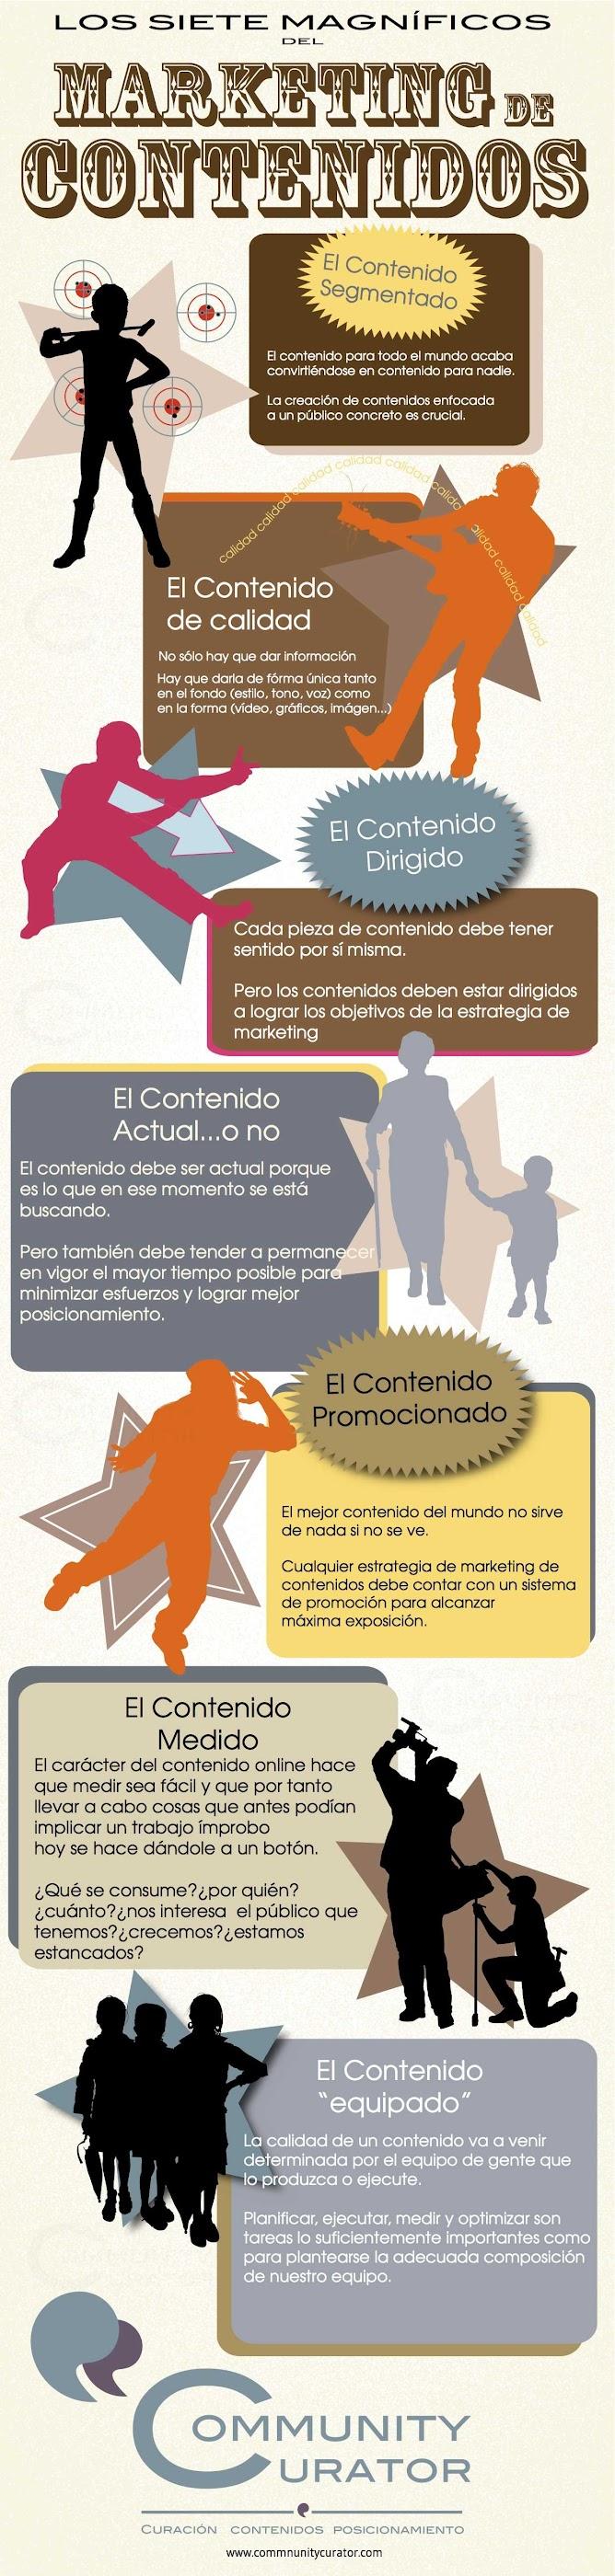 infografia consejos marketing contenidos